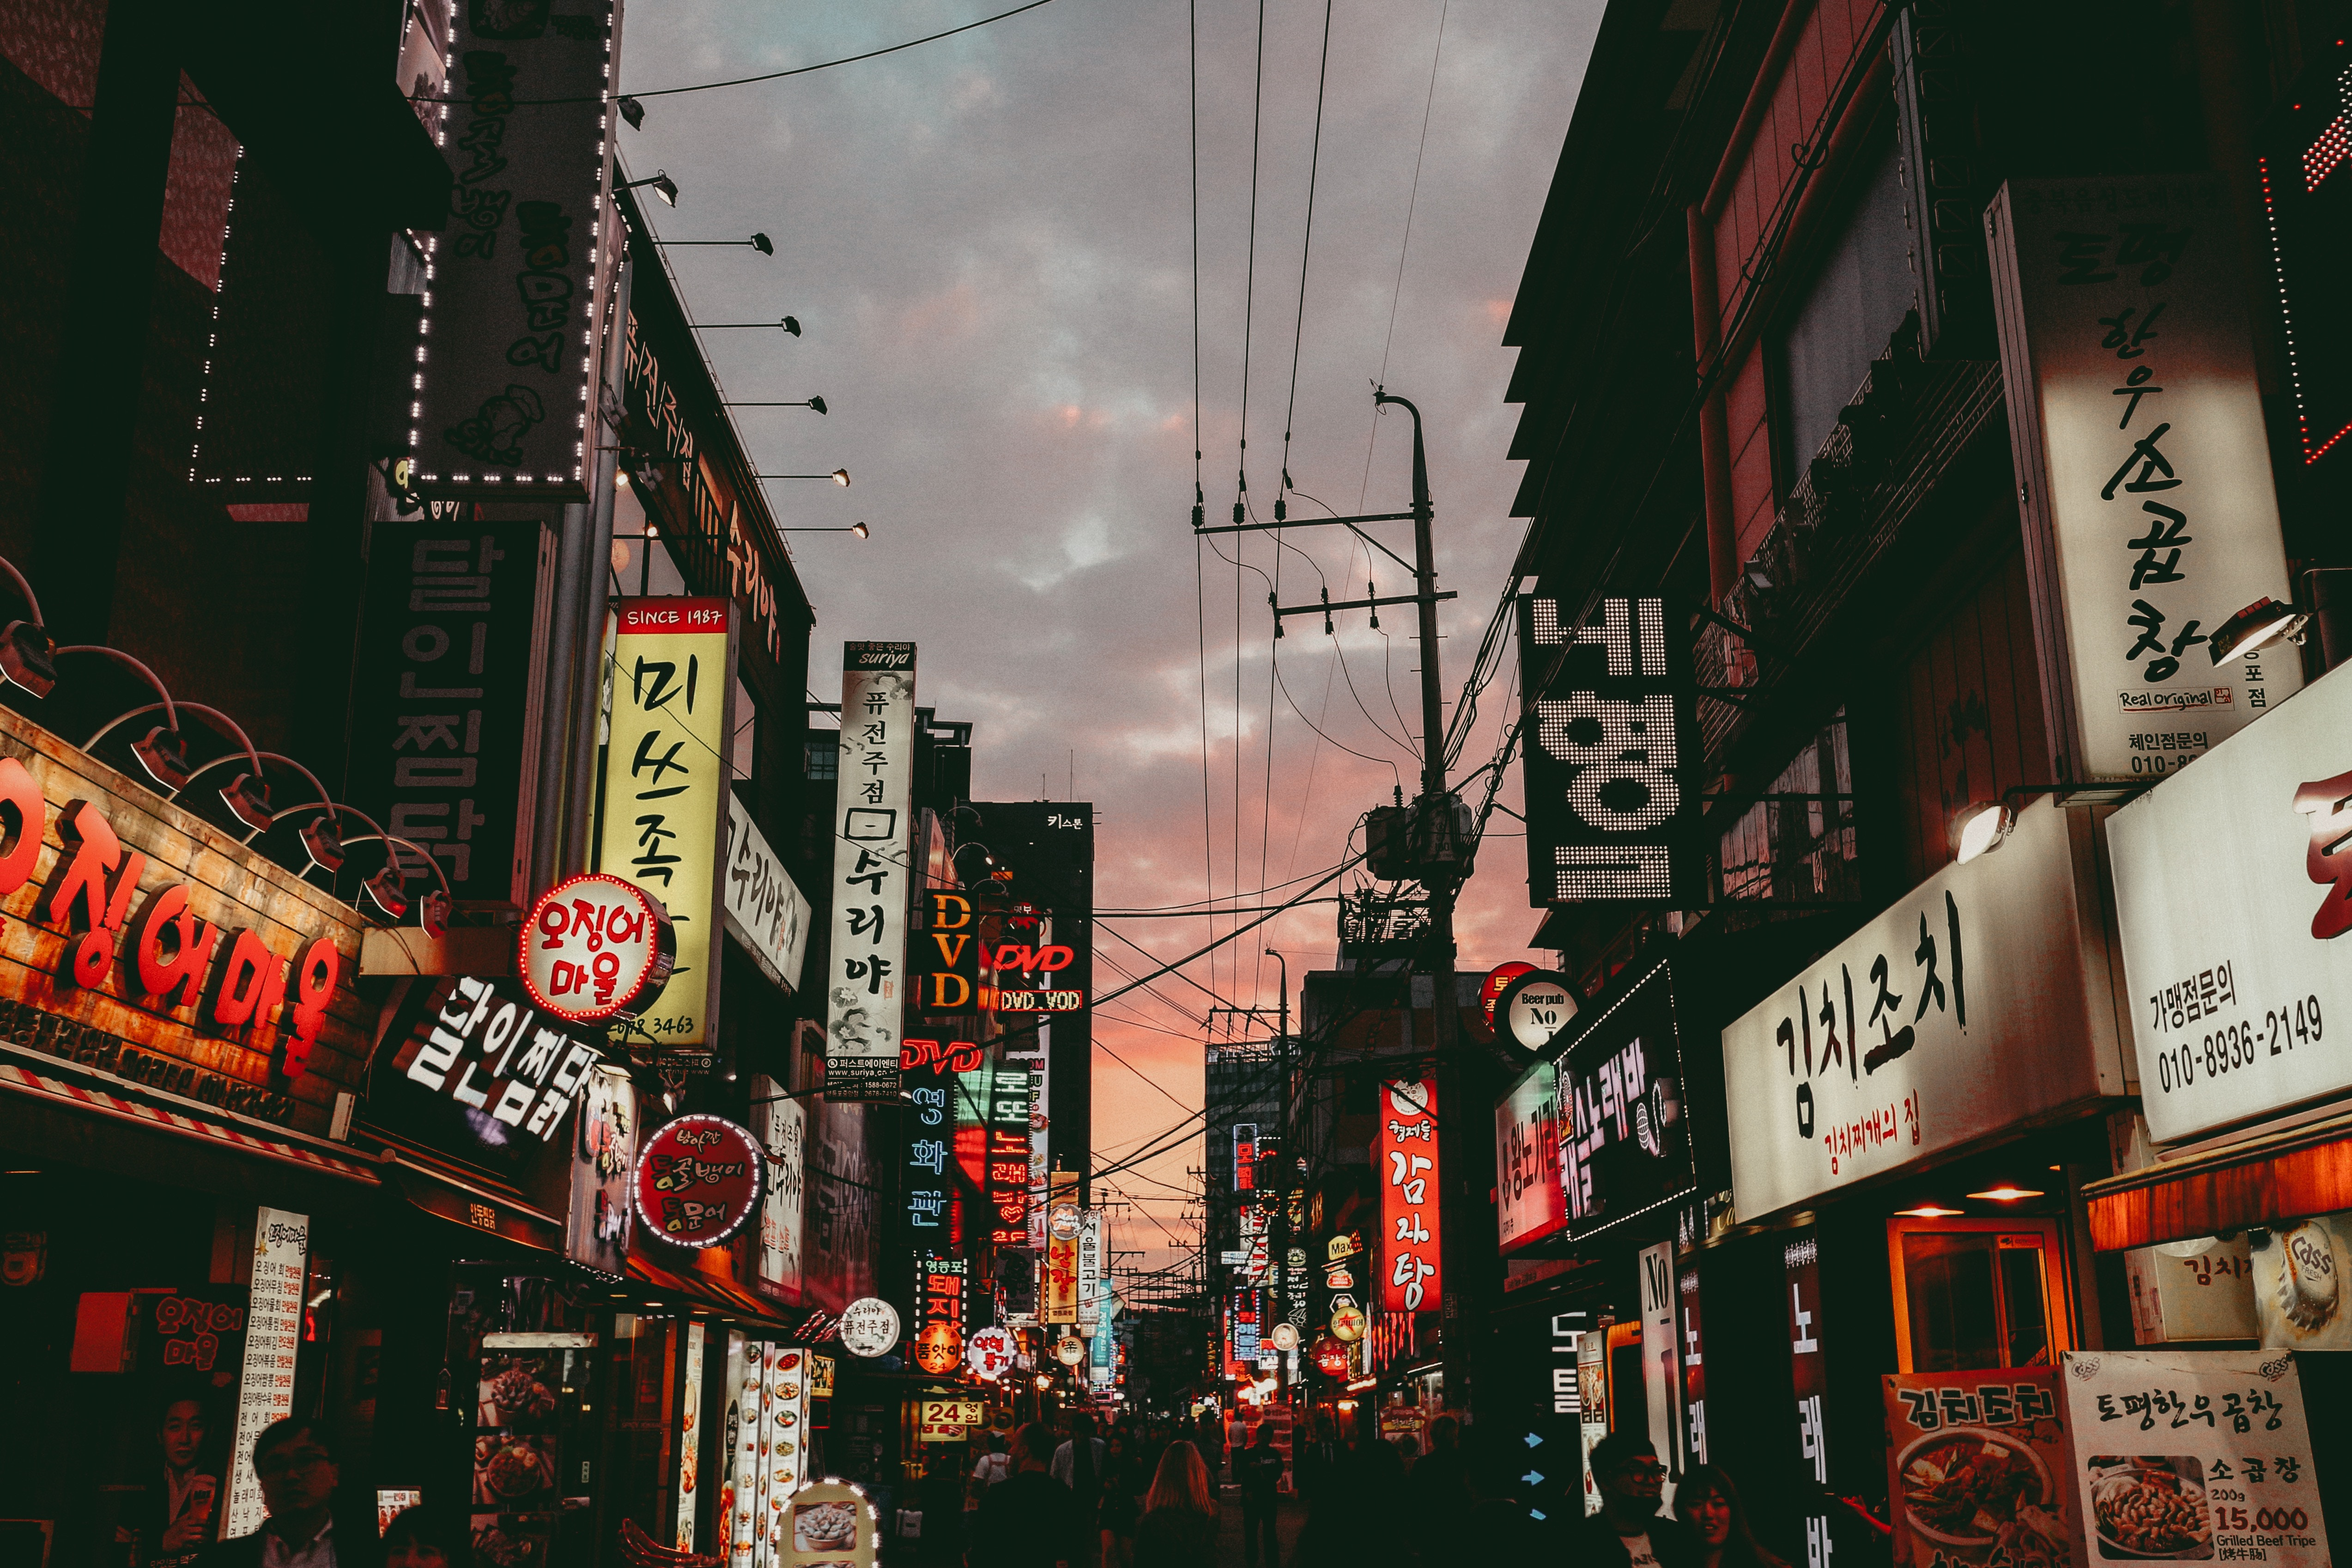 A shot of a Seoul street, taken at sunset.